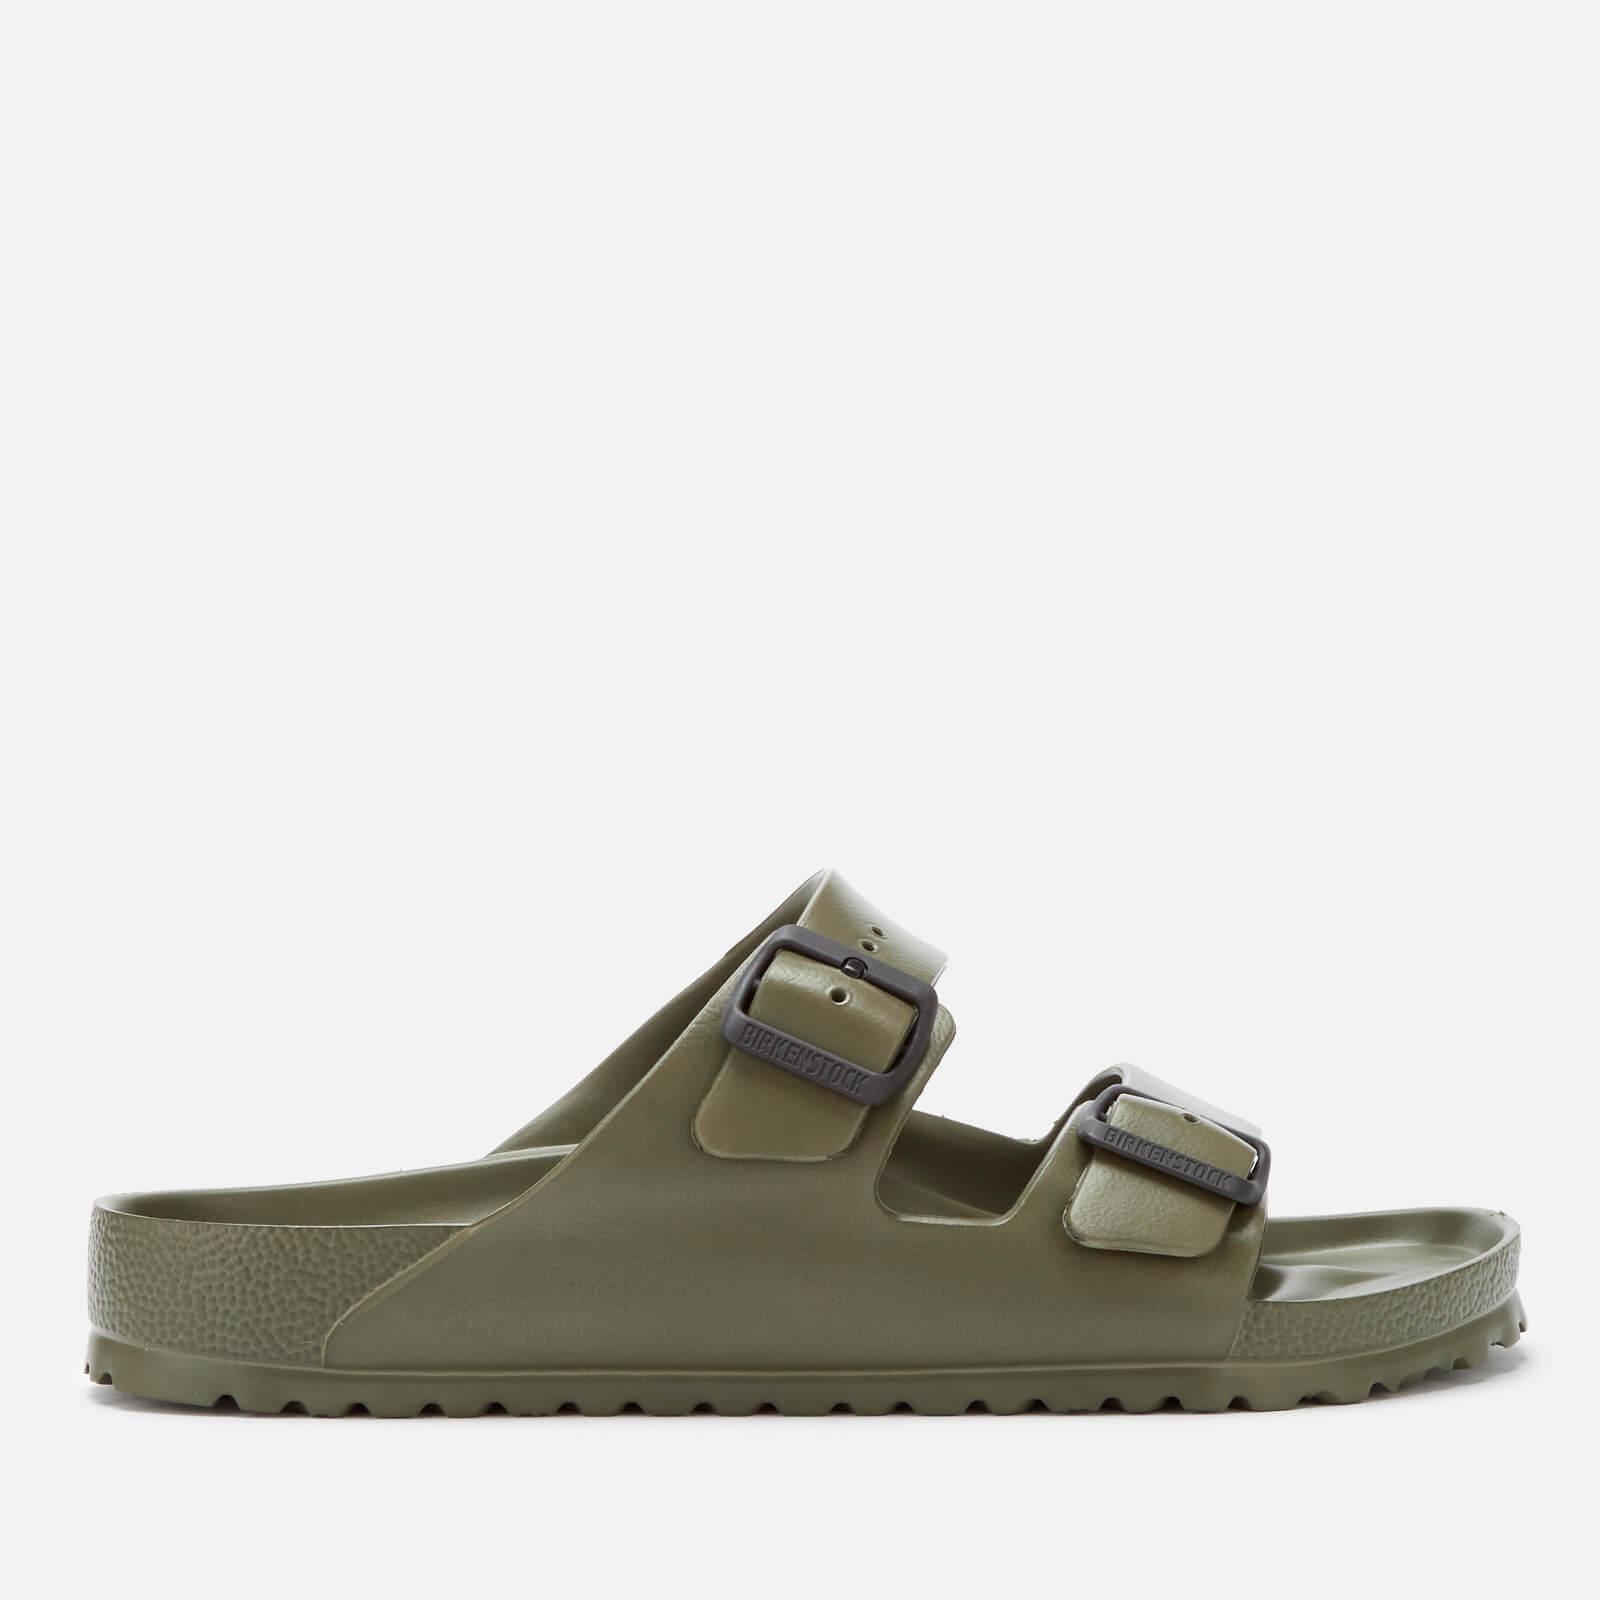 1ab5cadf7 Birkenstock Men's Arizona EVA Double Strap Sandals - Khaki Mens Footwear |  TheHut.com